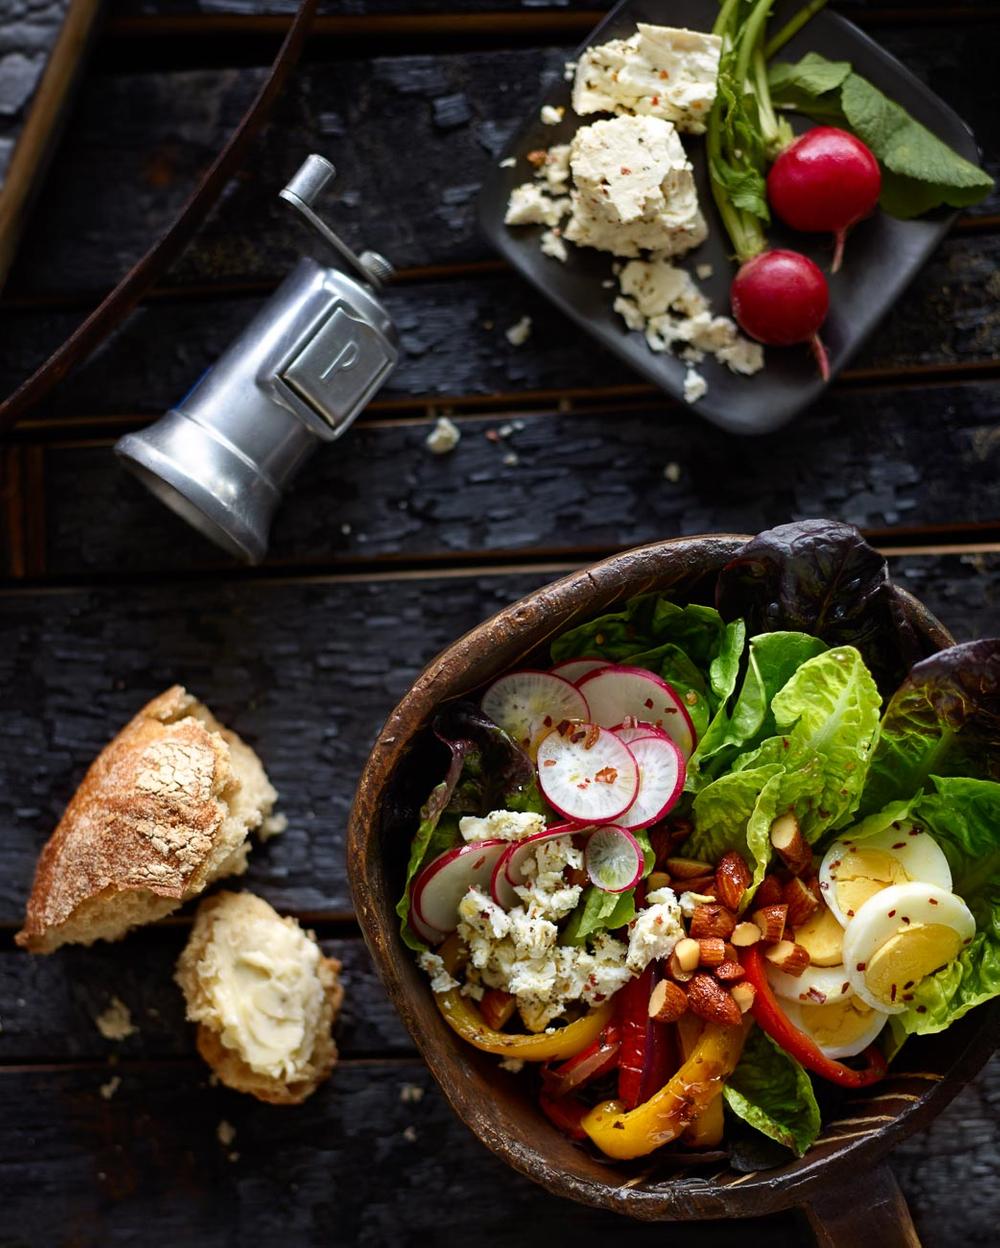 salad-bowl-food-stylist-san-francisco.jpg